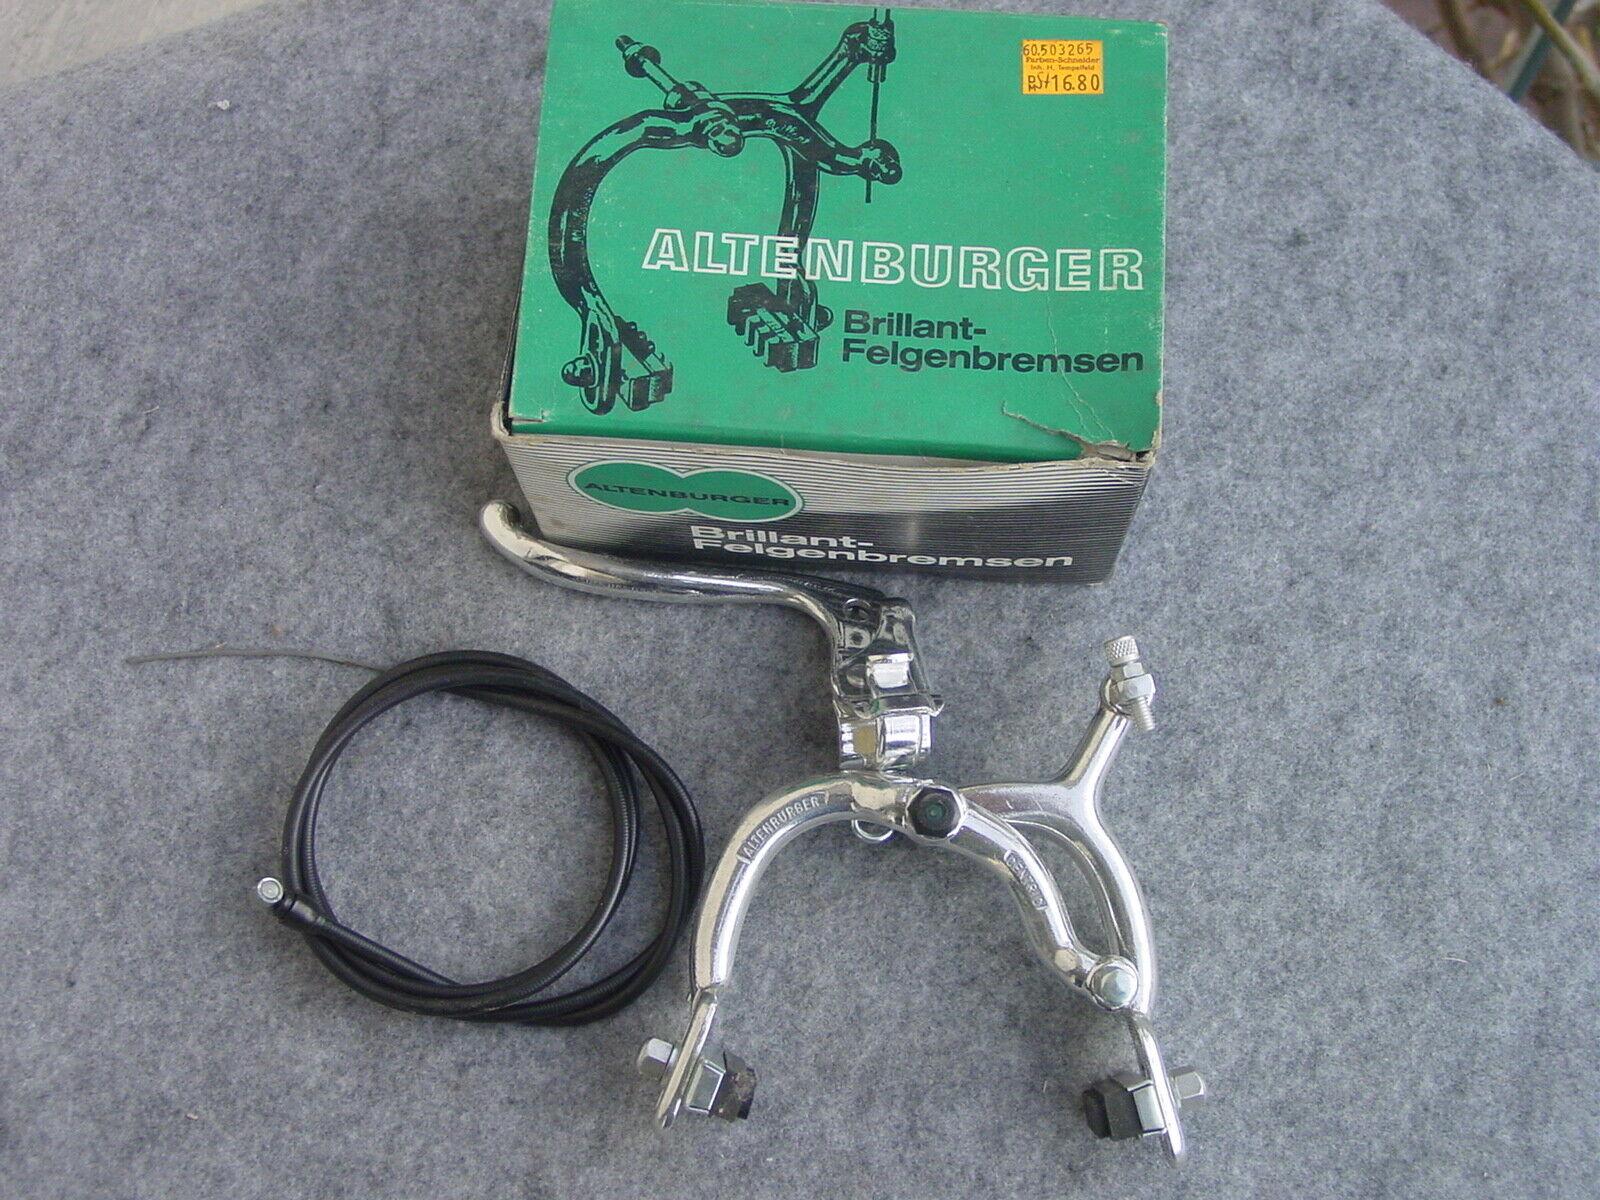 Altenburger Centric Rim Brake Rear Ovp New 1,75 Tire T II 58